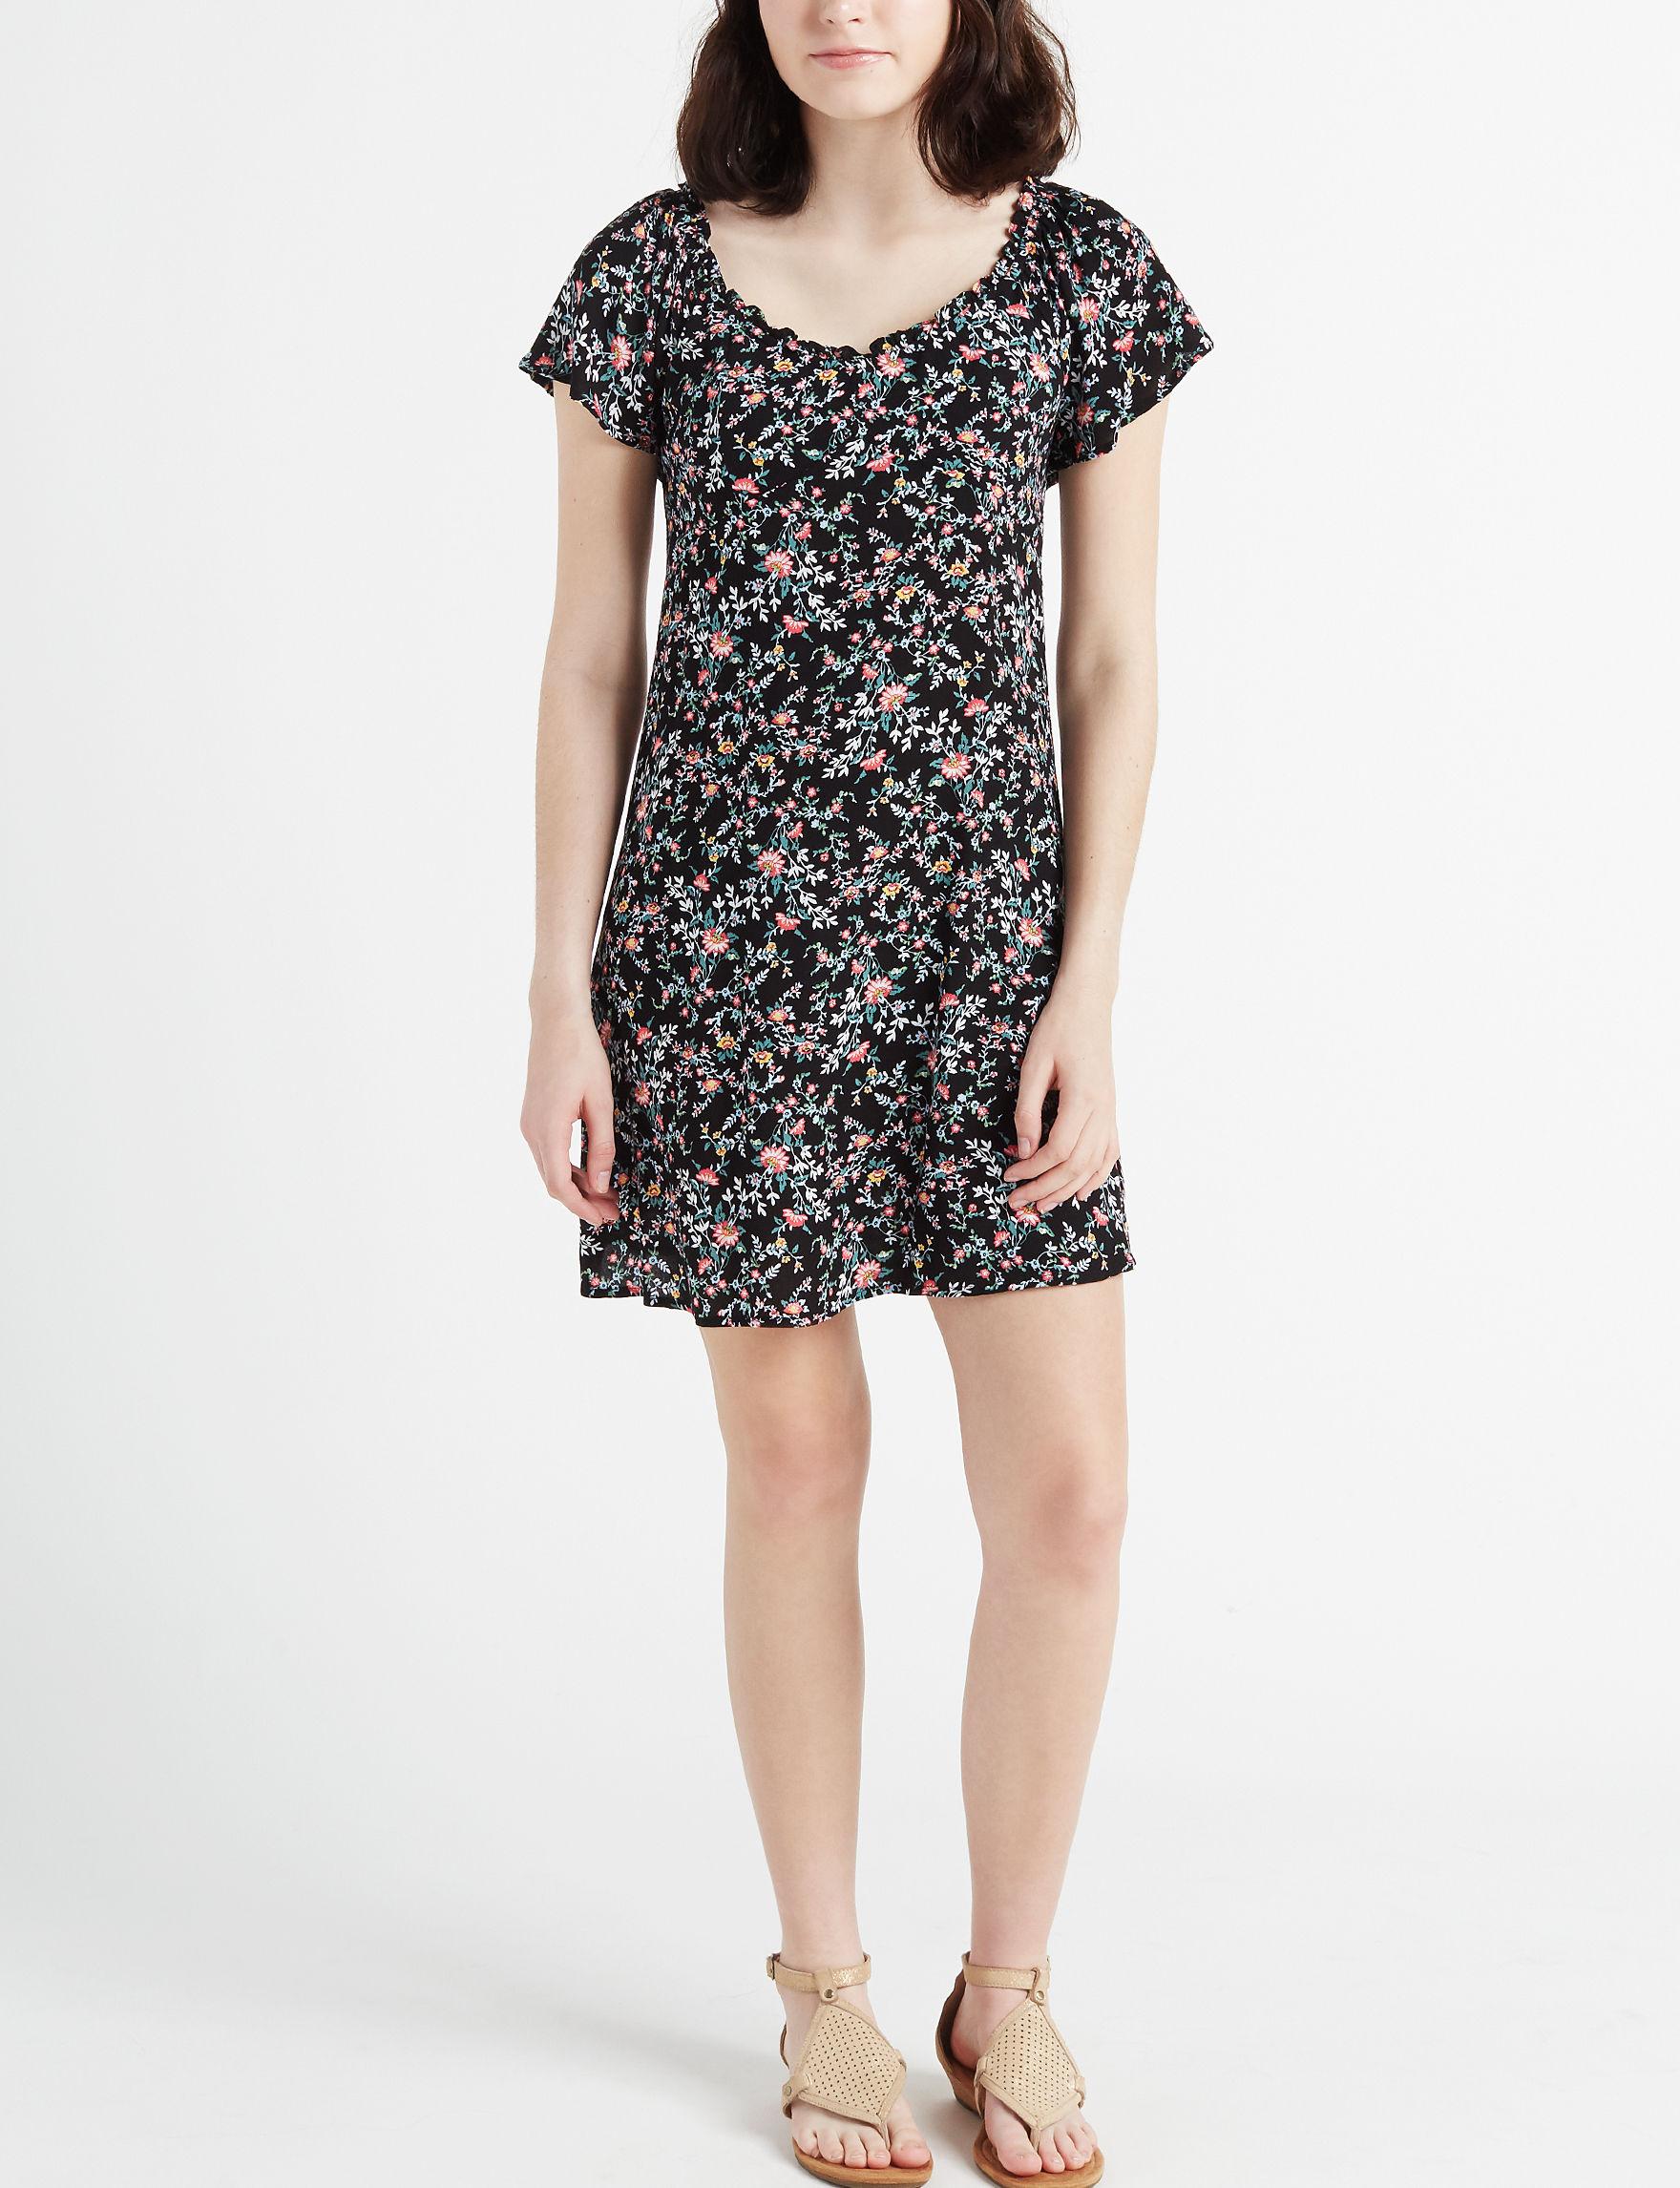 Trixxi Black / Blush Everyday & Casual Shift Dresses